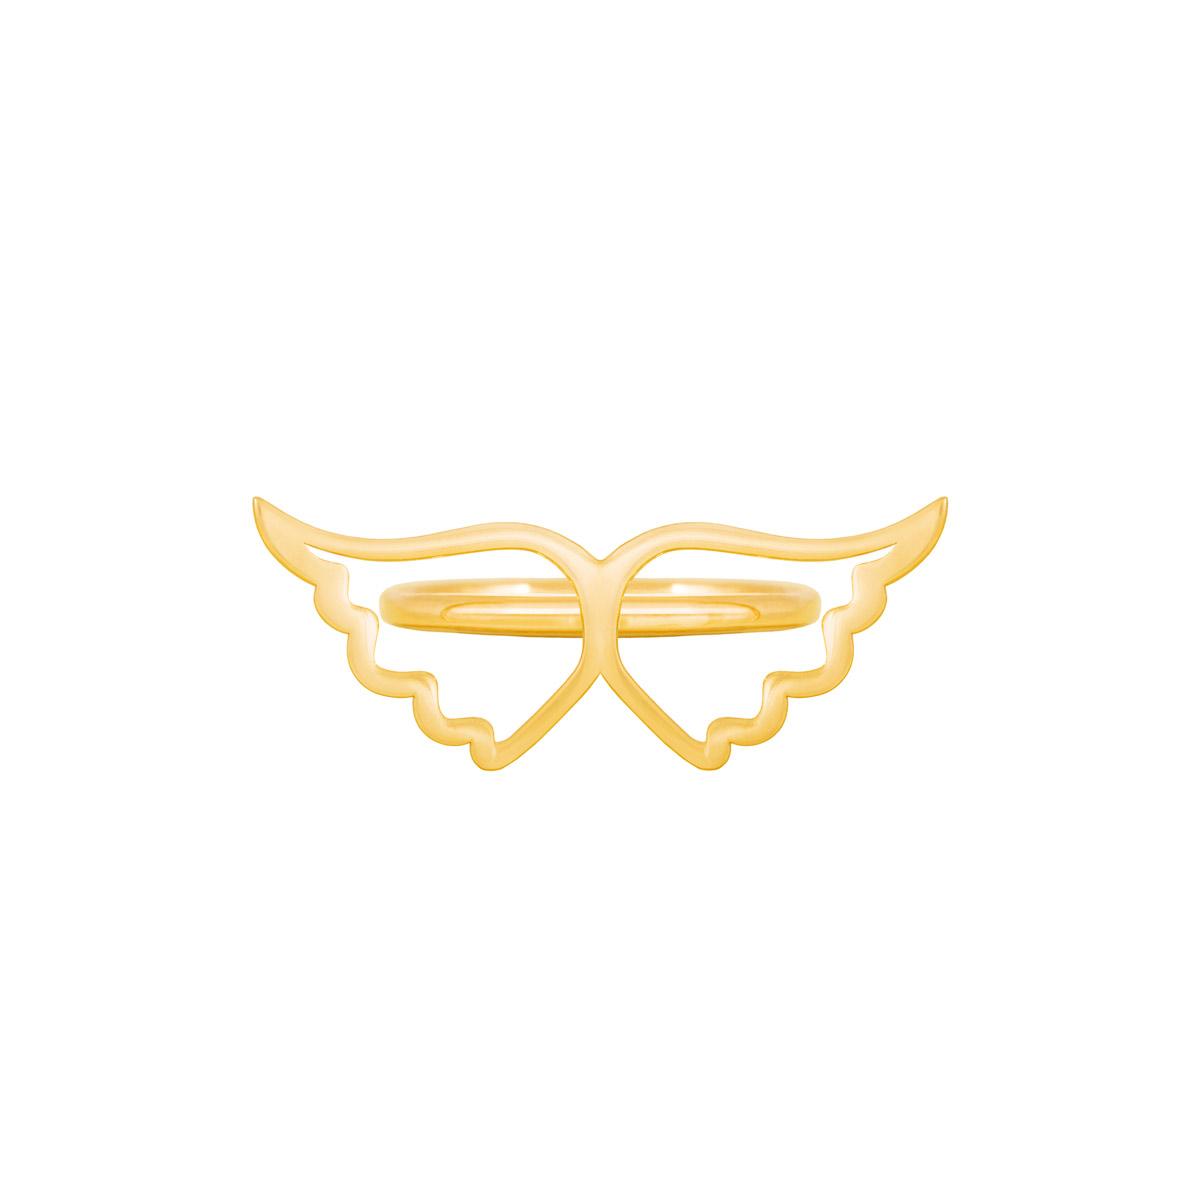 انگشتر طلا بال فرشته توخالی |parasteh